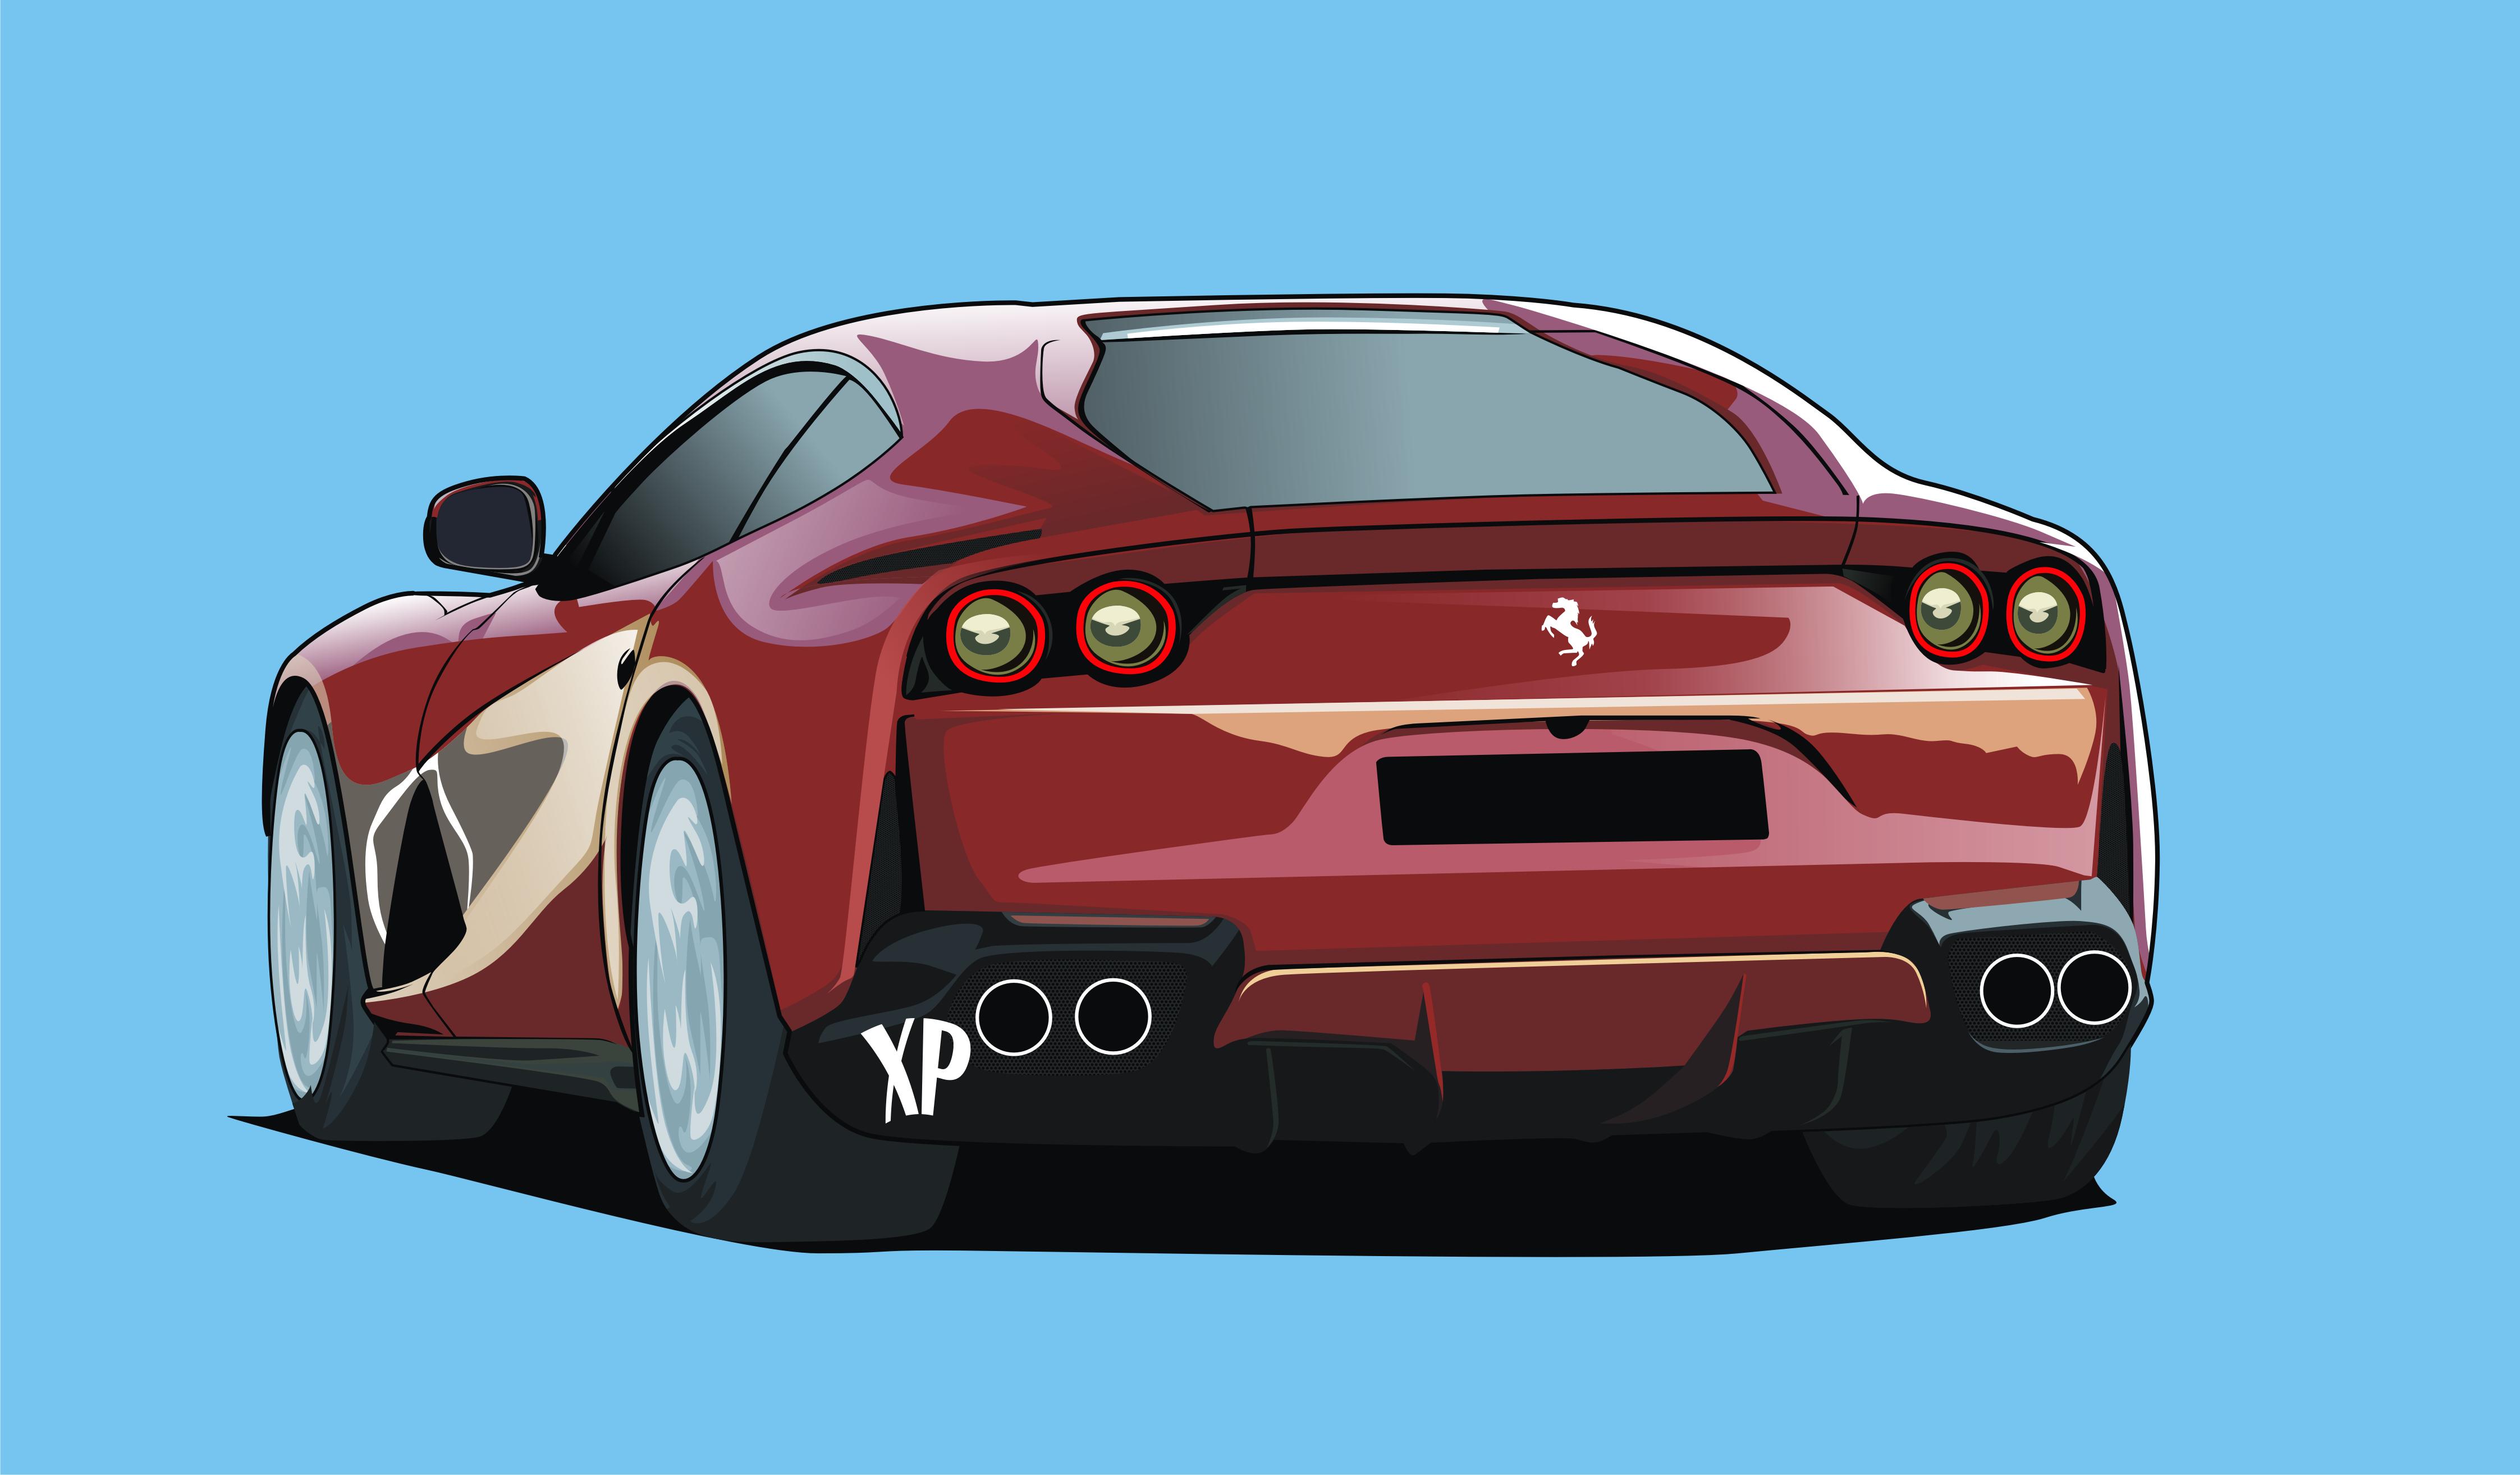 Supercar In Cartoon Sytle Cars Cartoon Vector Ferrari Cartoon Styles Graphic Design Services Super Cars